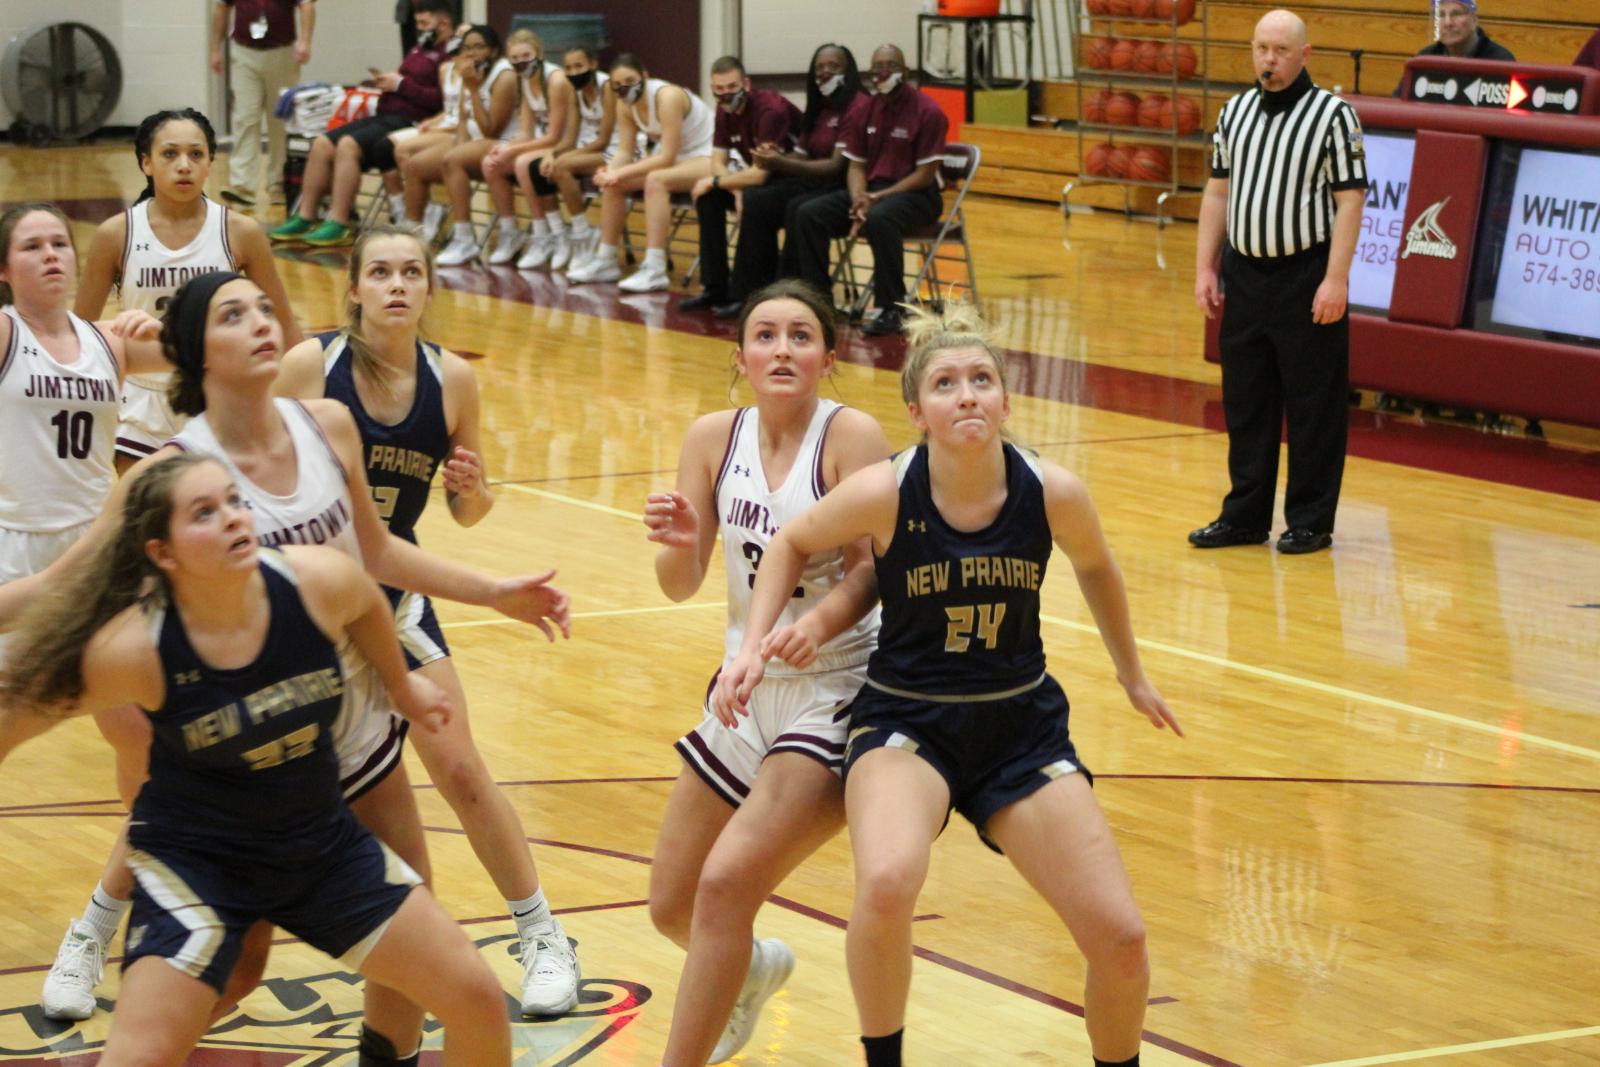 Girls Varsity Basketball @ Jimtown 12/17/20  (Photo Gallery)